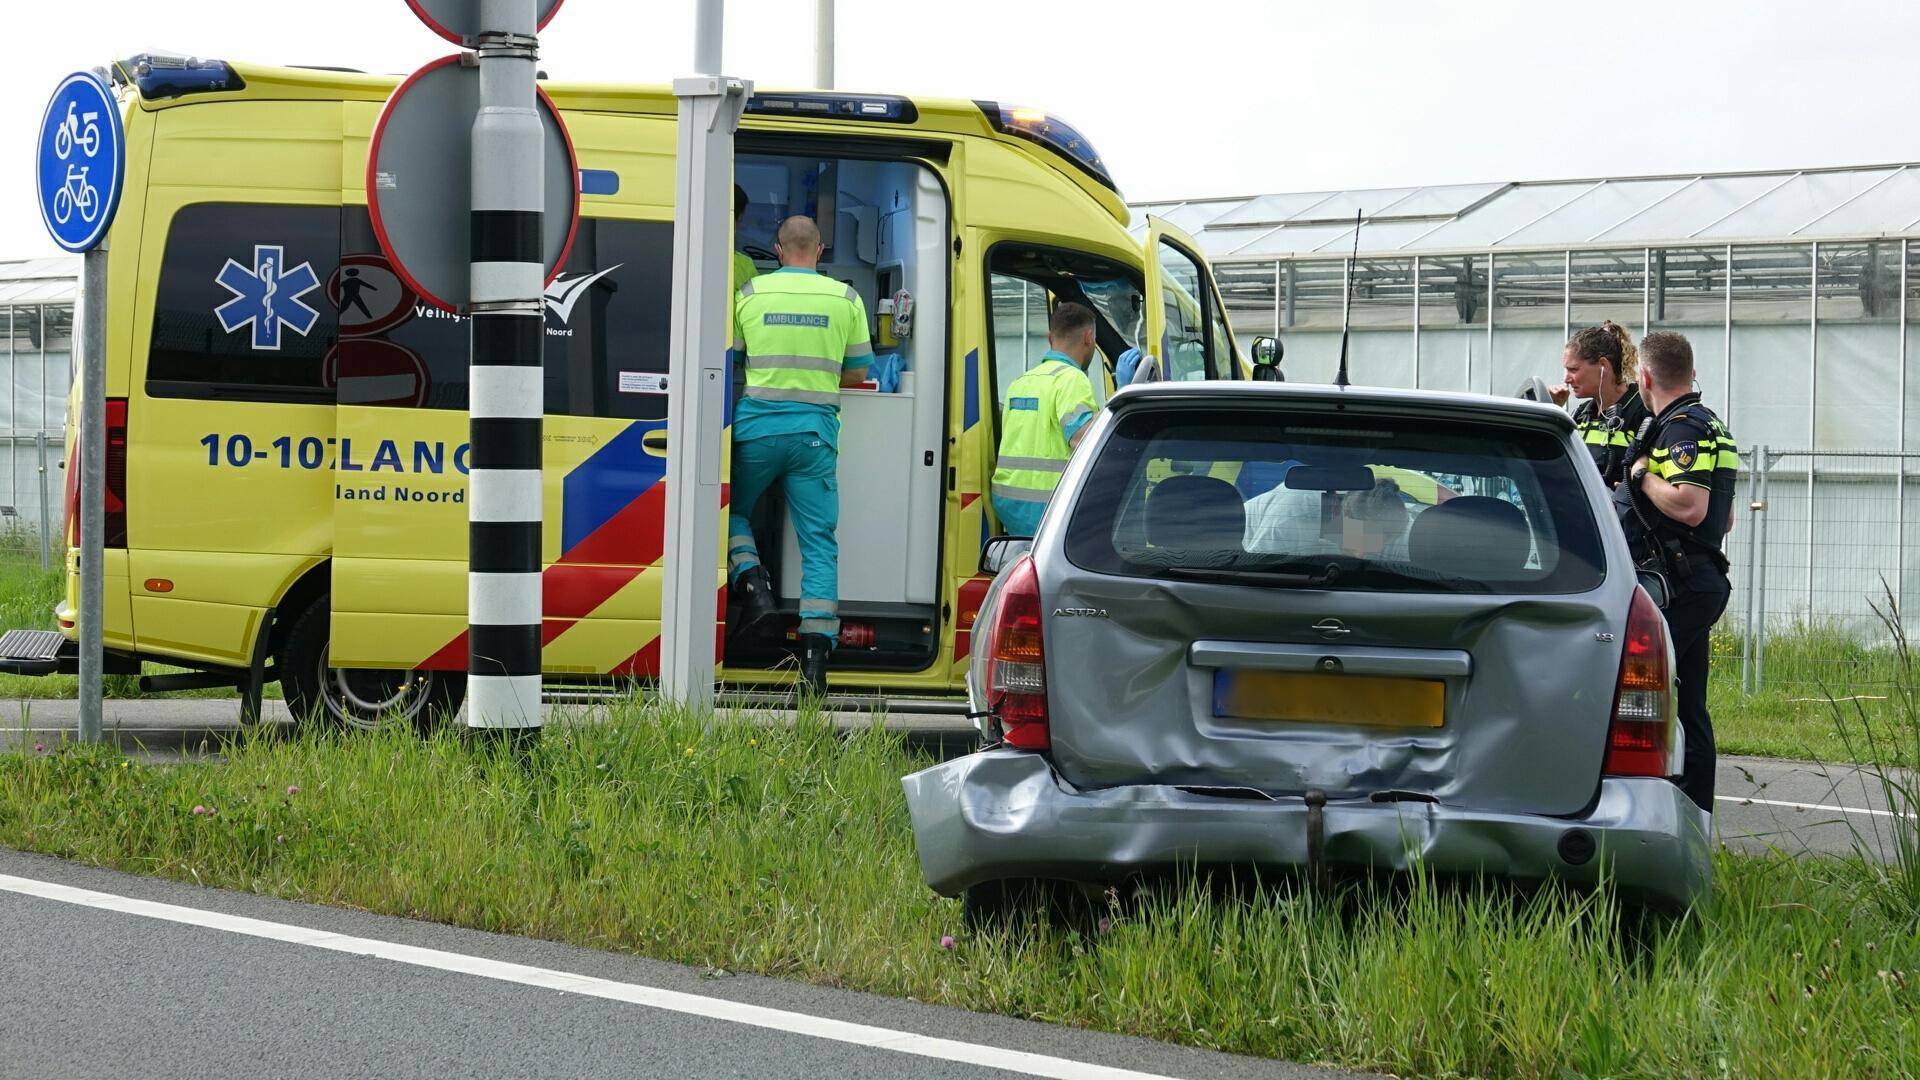 Gewonde bij kop-staartbotsing op afrit N307 in Zwaag, auto's total loss